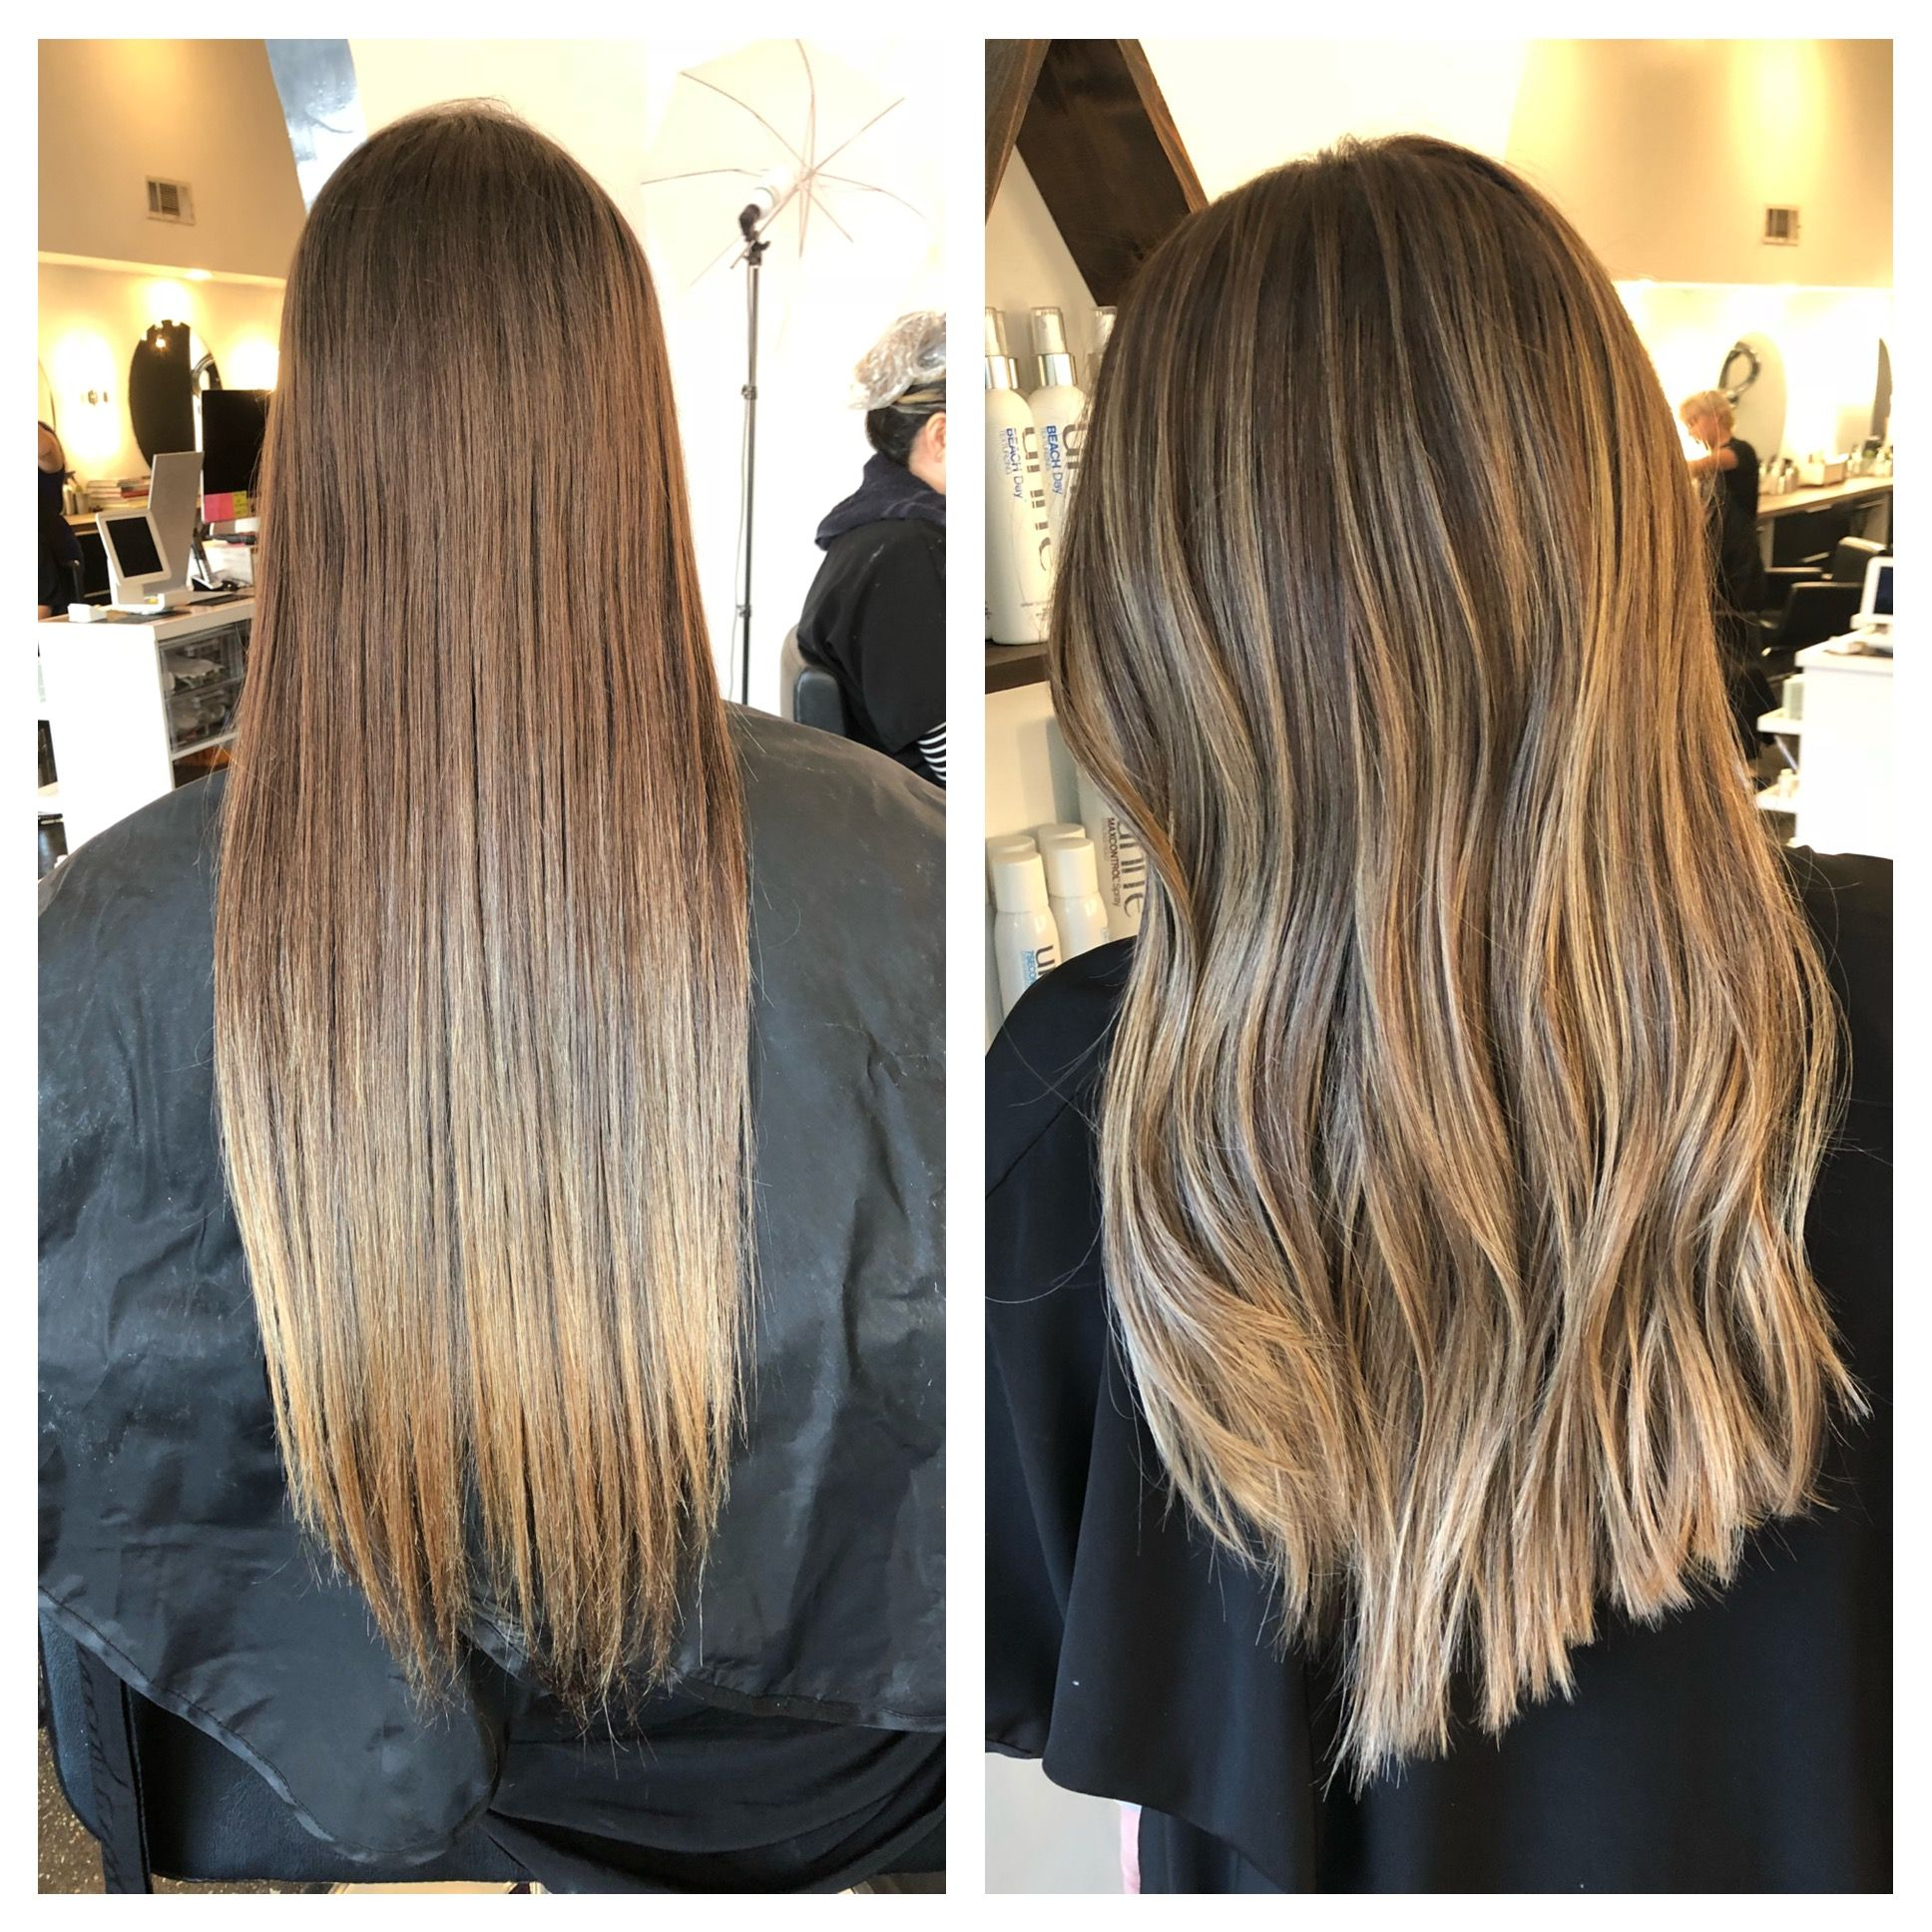 Balayage before and after hair ideas pinterest balayage